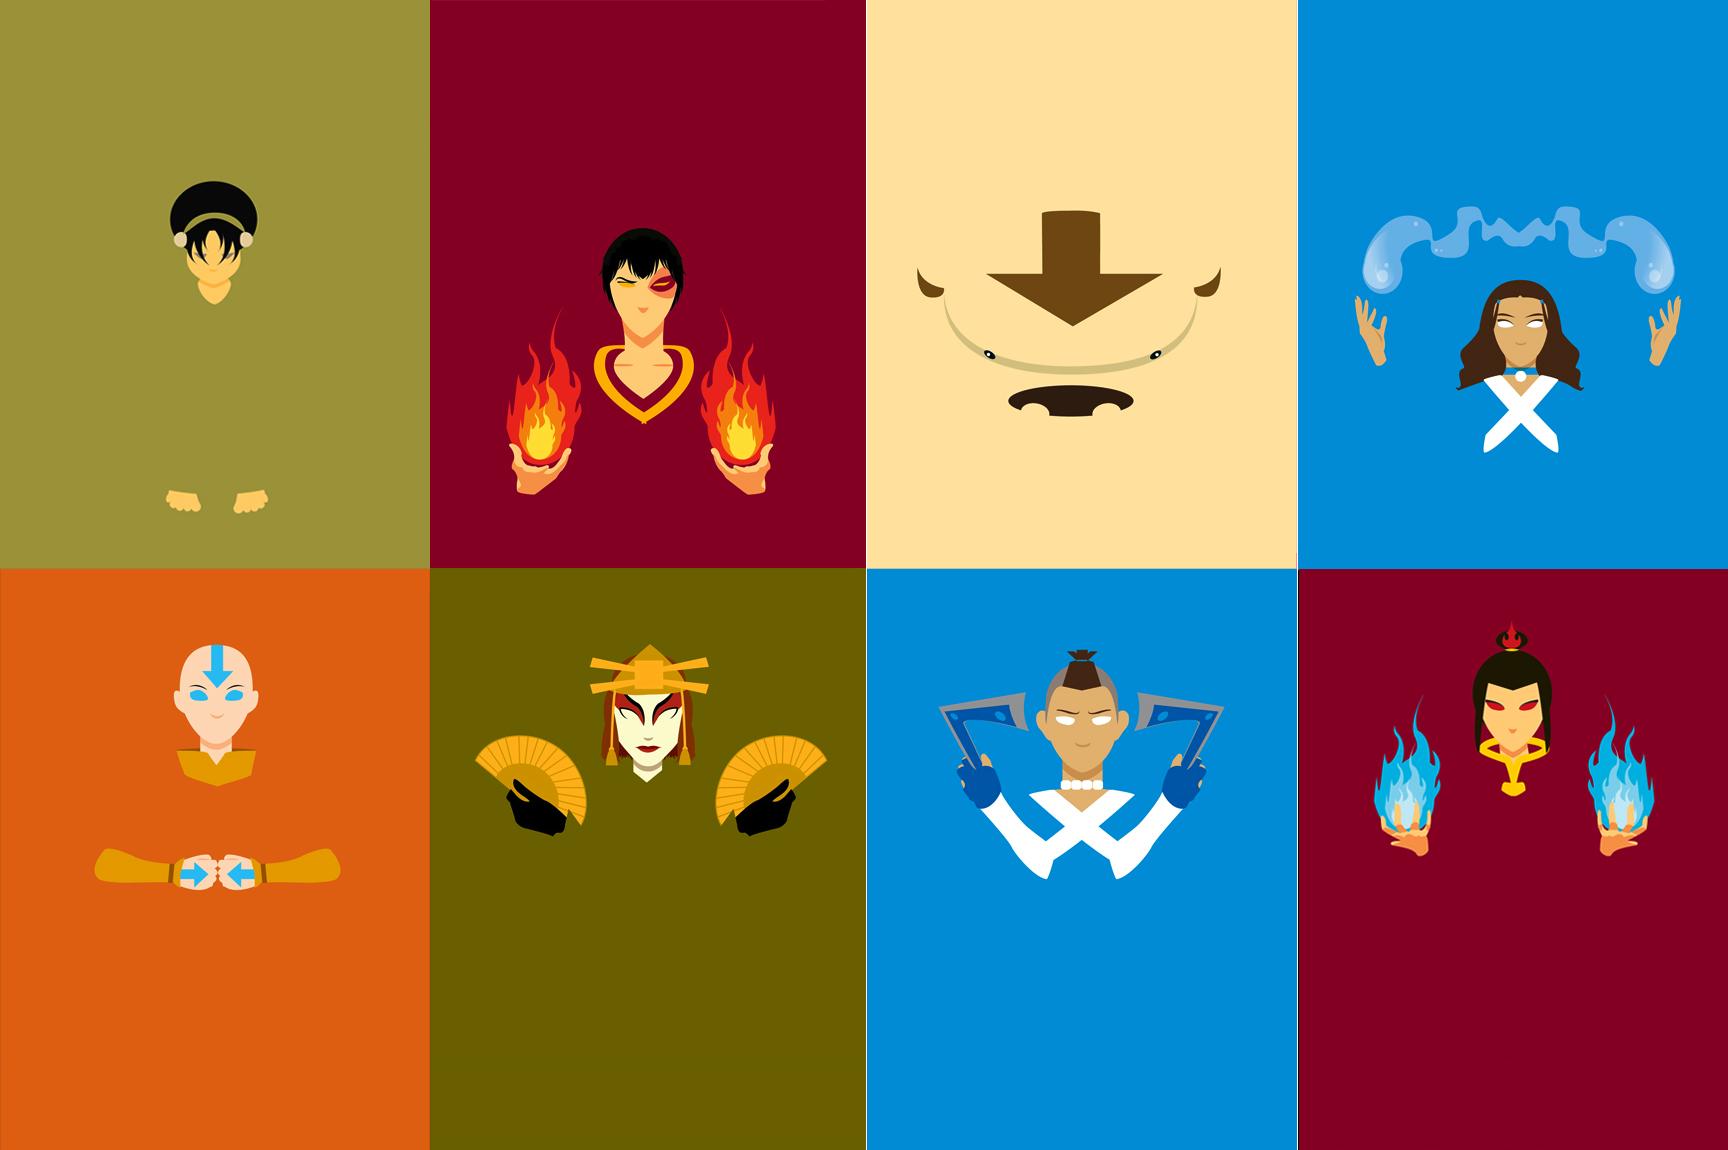 Minimalist Avatar The Last Airbender Poster Avatar The Last Airbender Avatar Characters Avatar